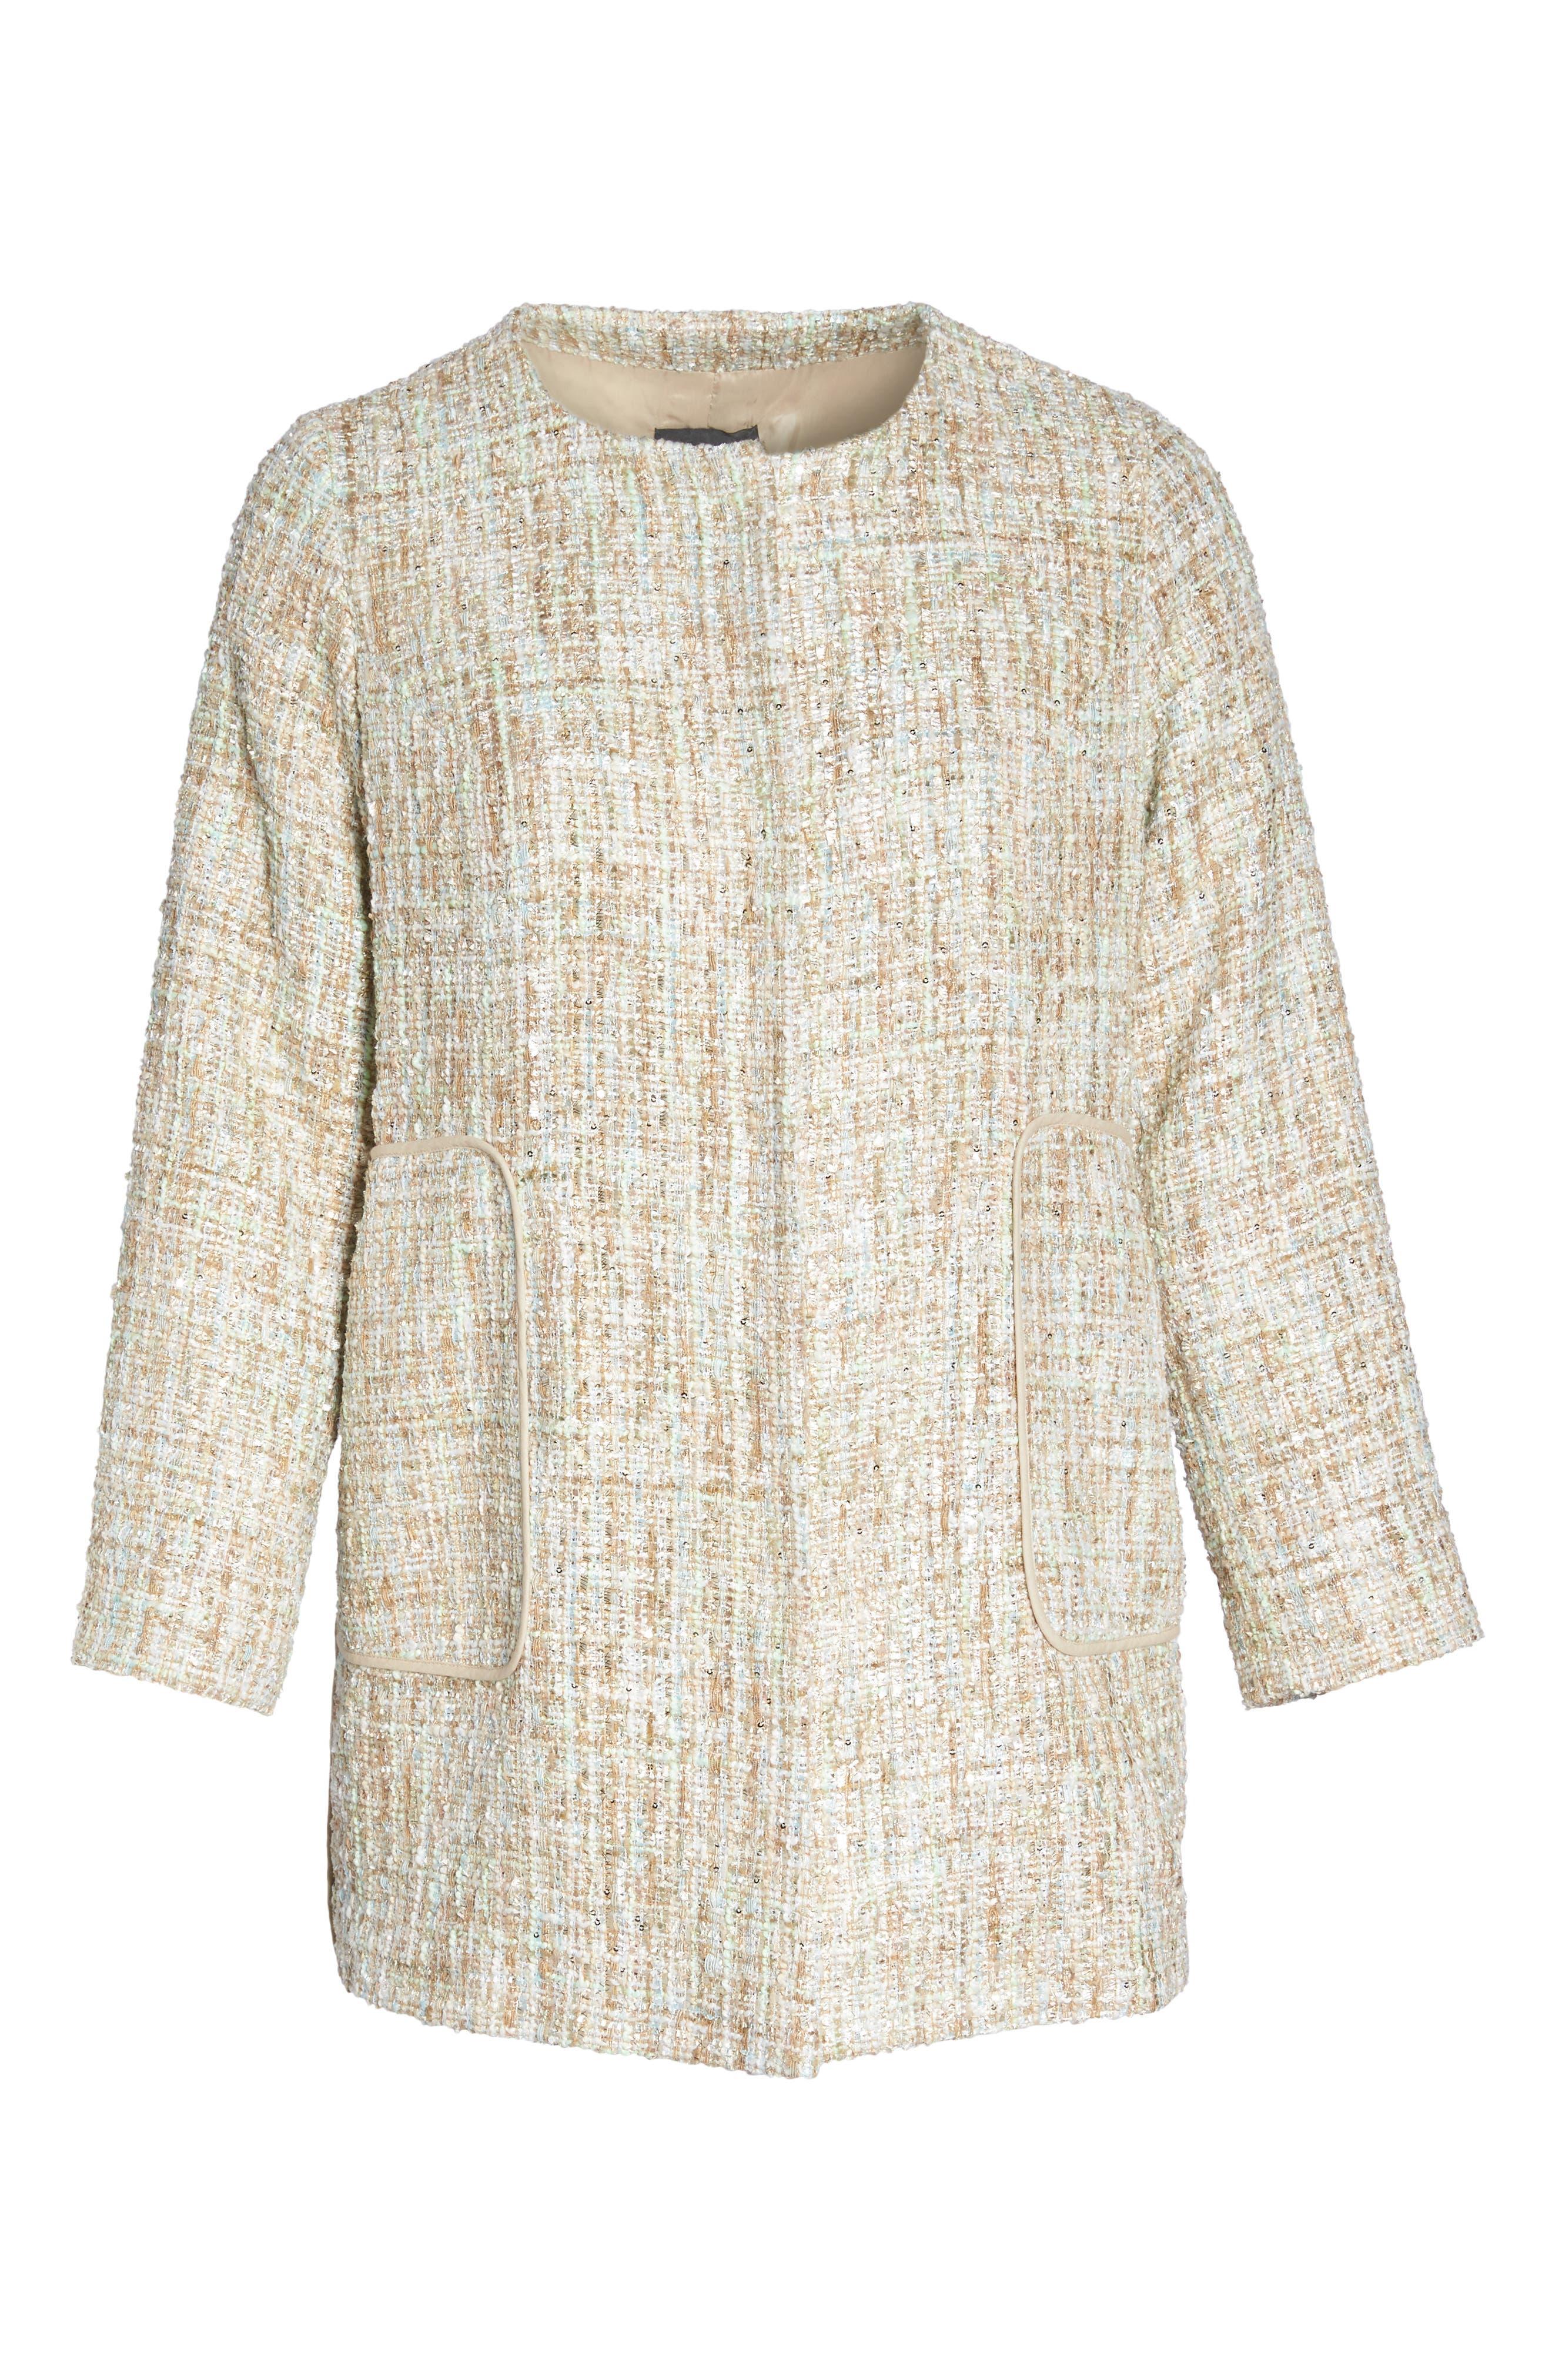 Metallic Tweed Jacket,                             Alternate thumbnail 7, color,                             White